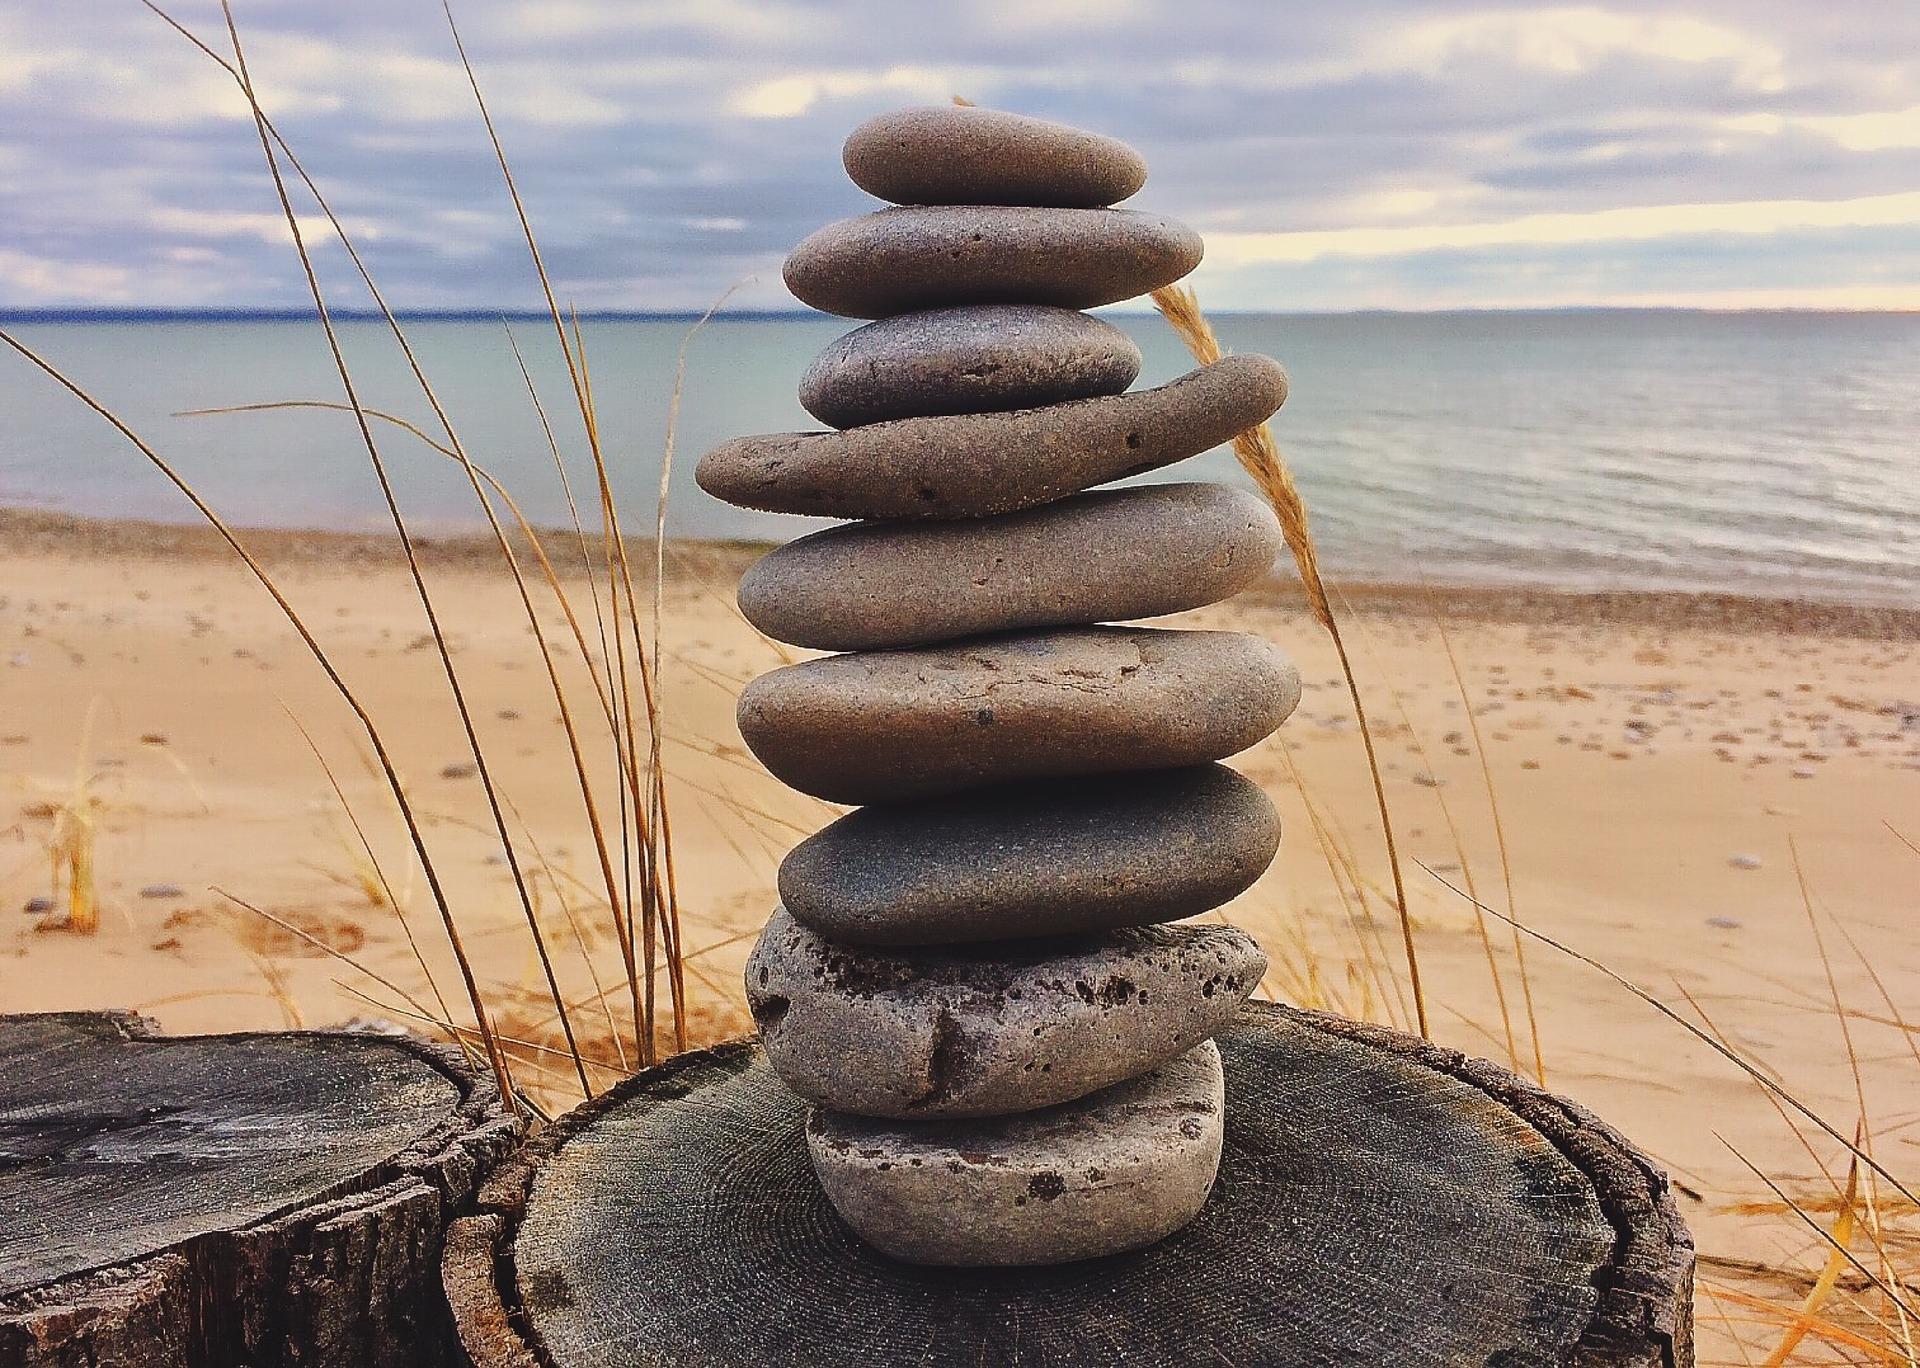 Balanced Rocks